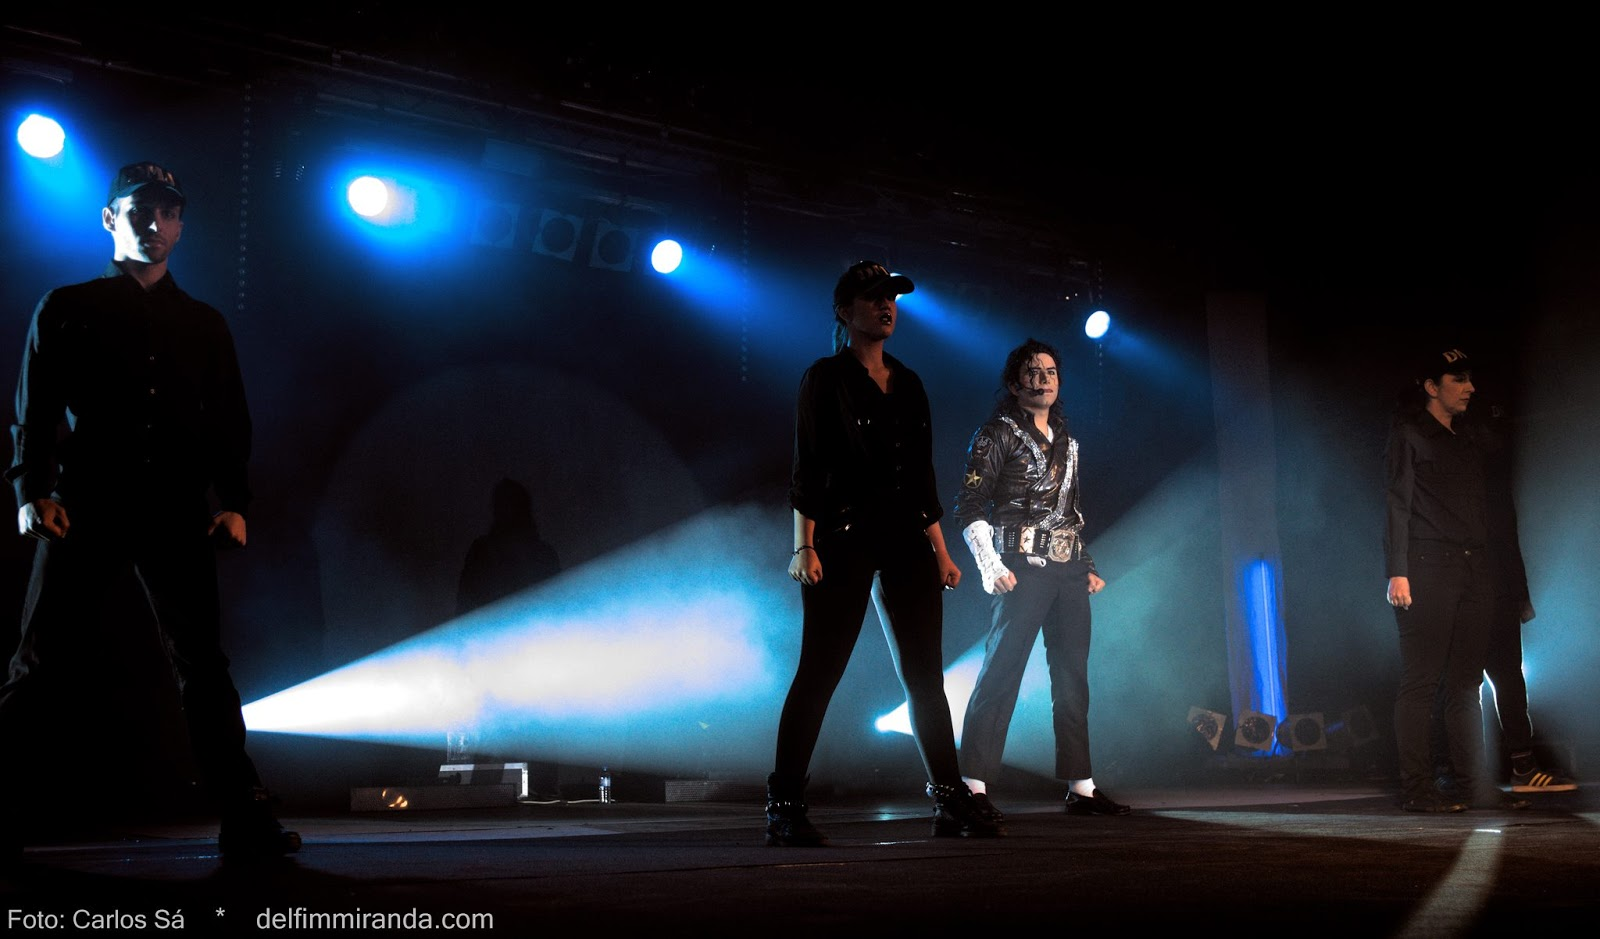 Delfim Miranda - Michael Jackson Tribute - Jam - Stage side view